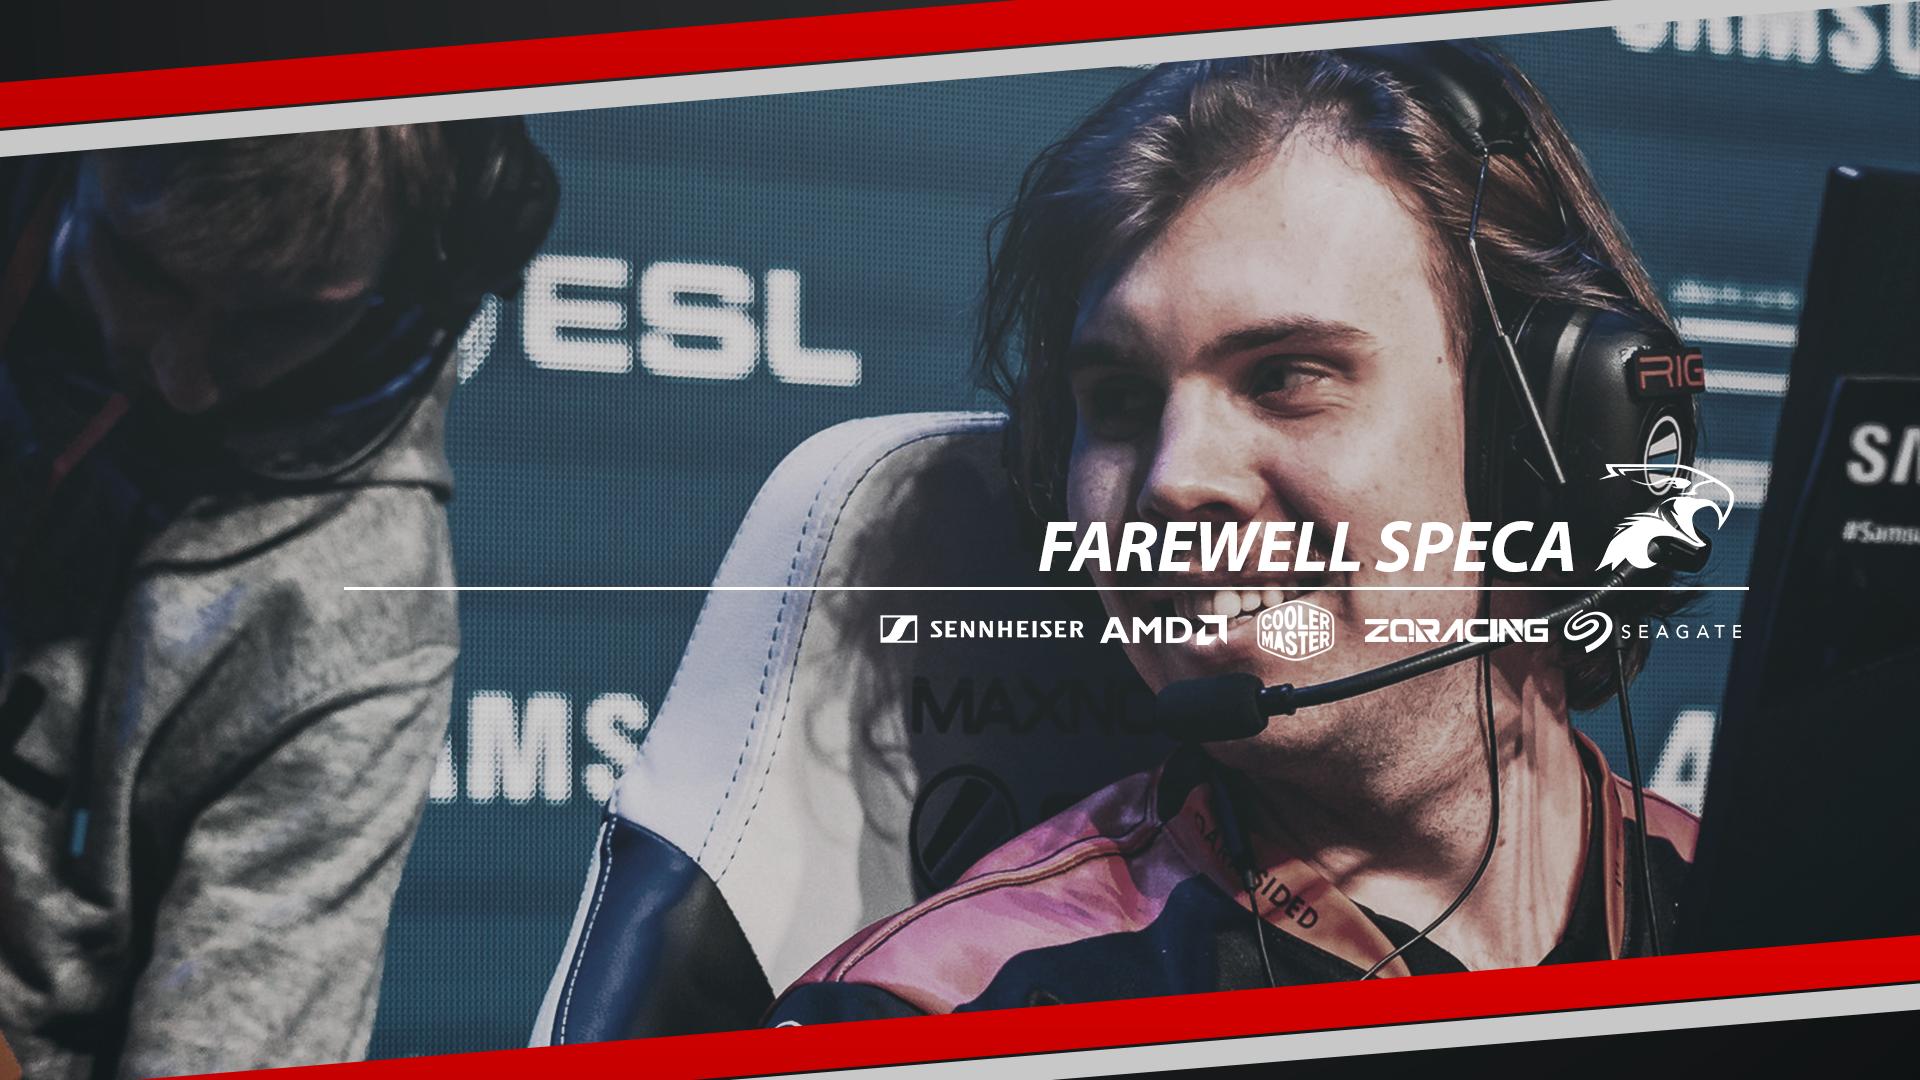 farewell speca.png